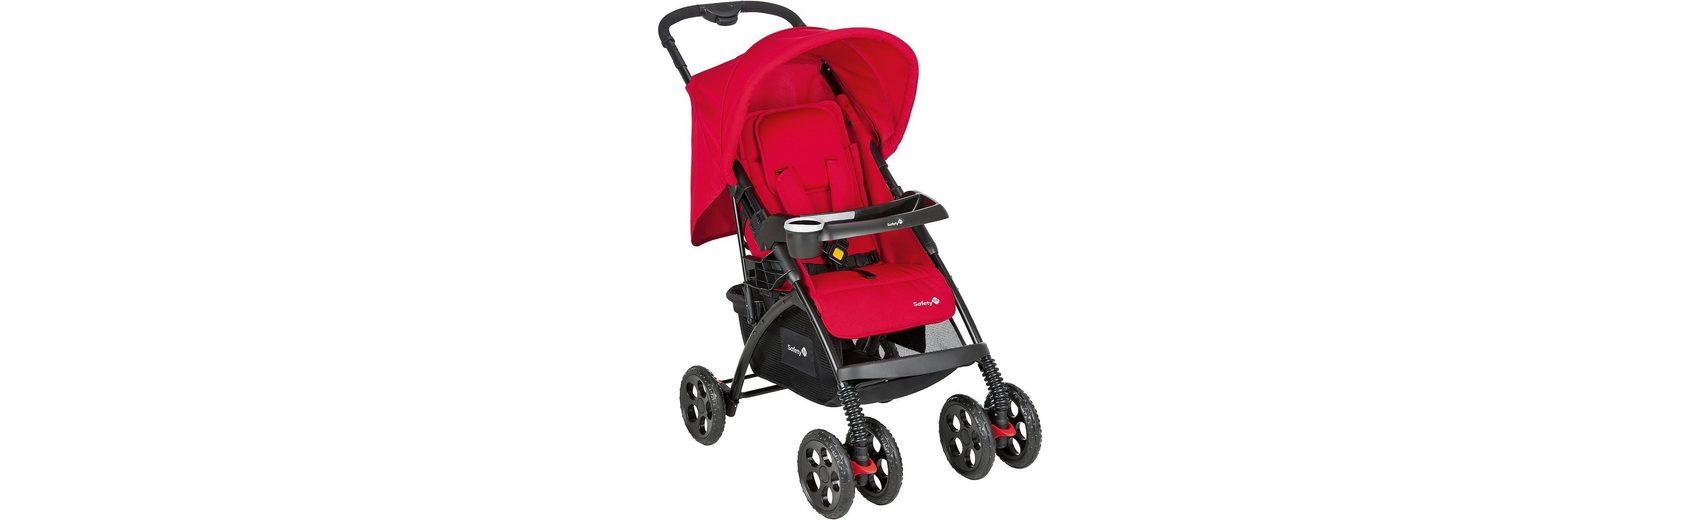 Safety 1st Sportwagen Trendideal Confort, full red